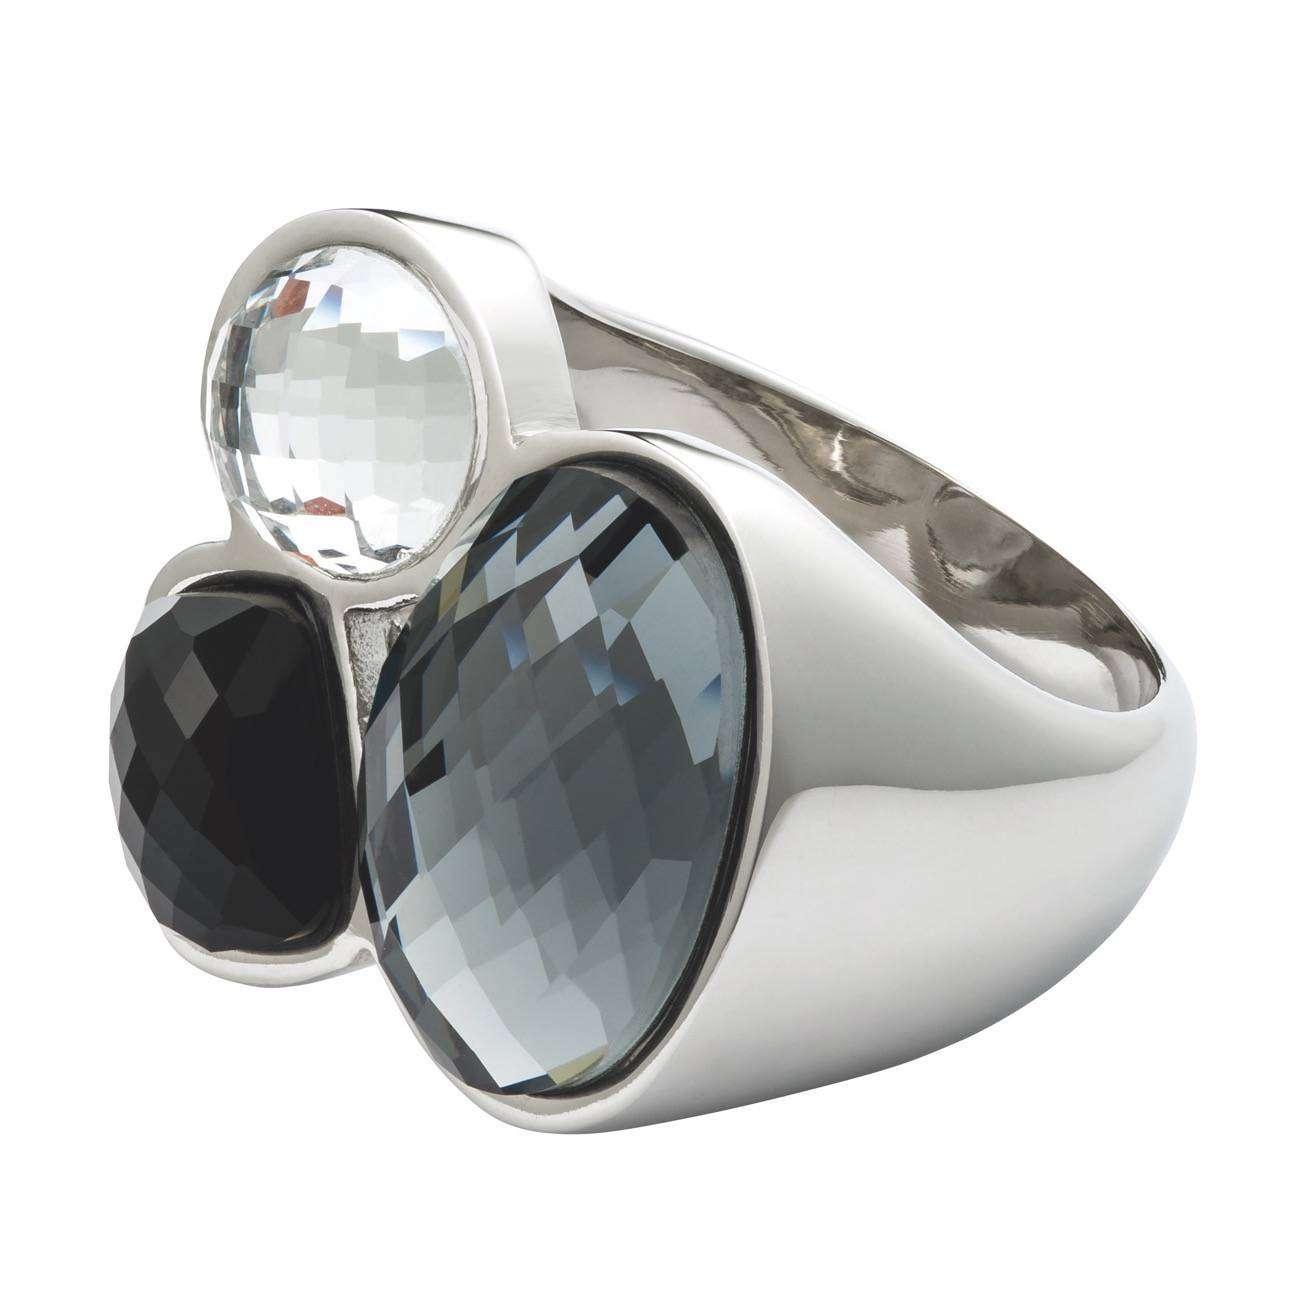 PIPPAJEAN Anillo Crystal Dream Negro PVP4990euros